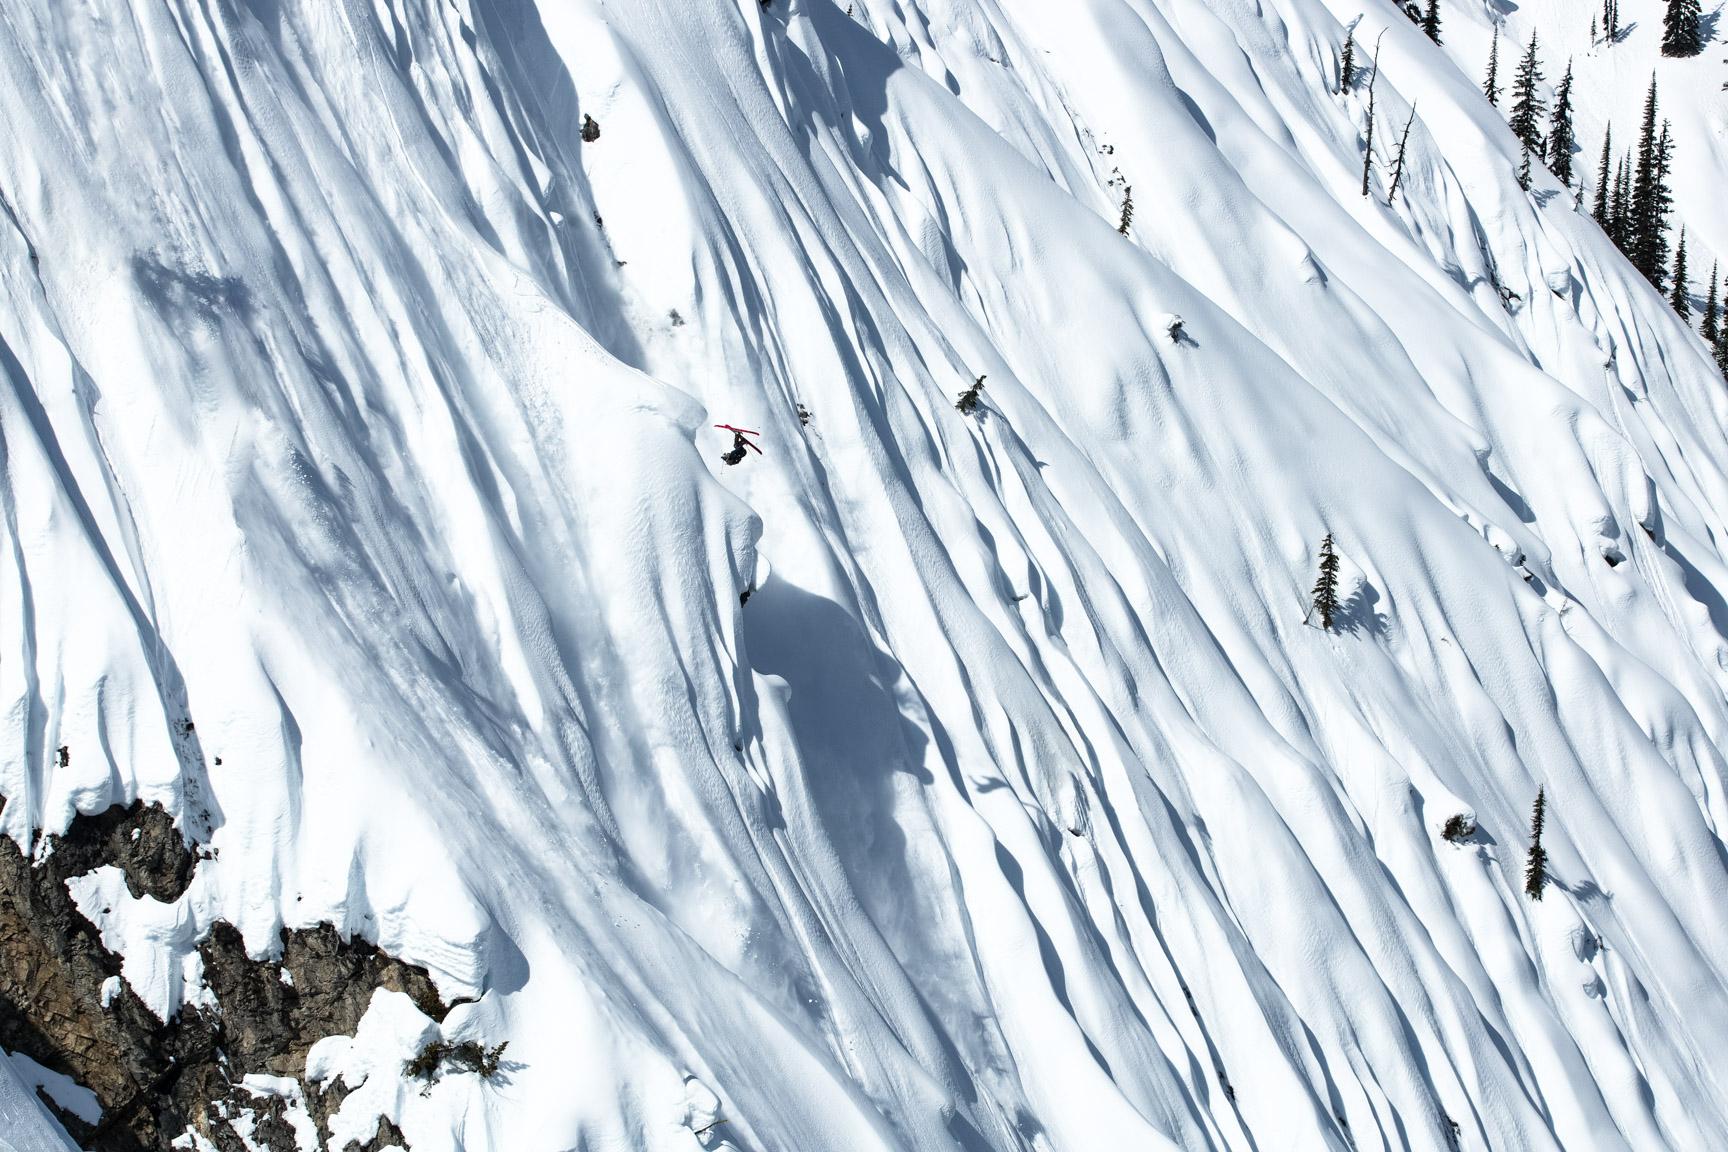 Markus Eder, Revelstoke, British Columbia